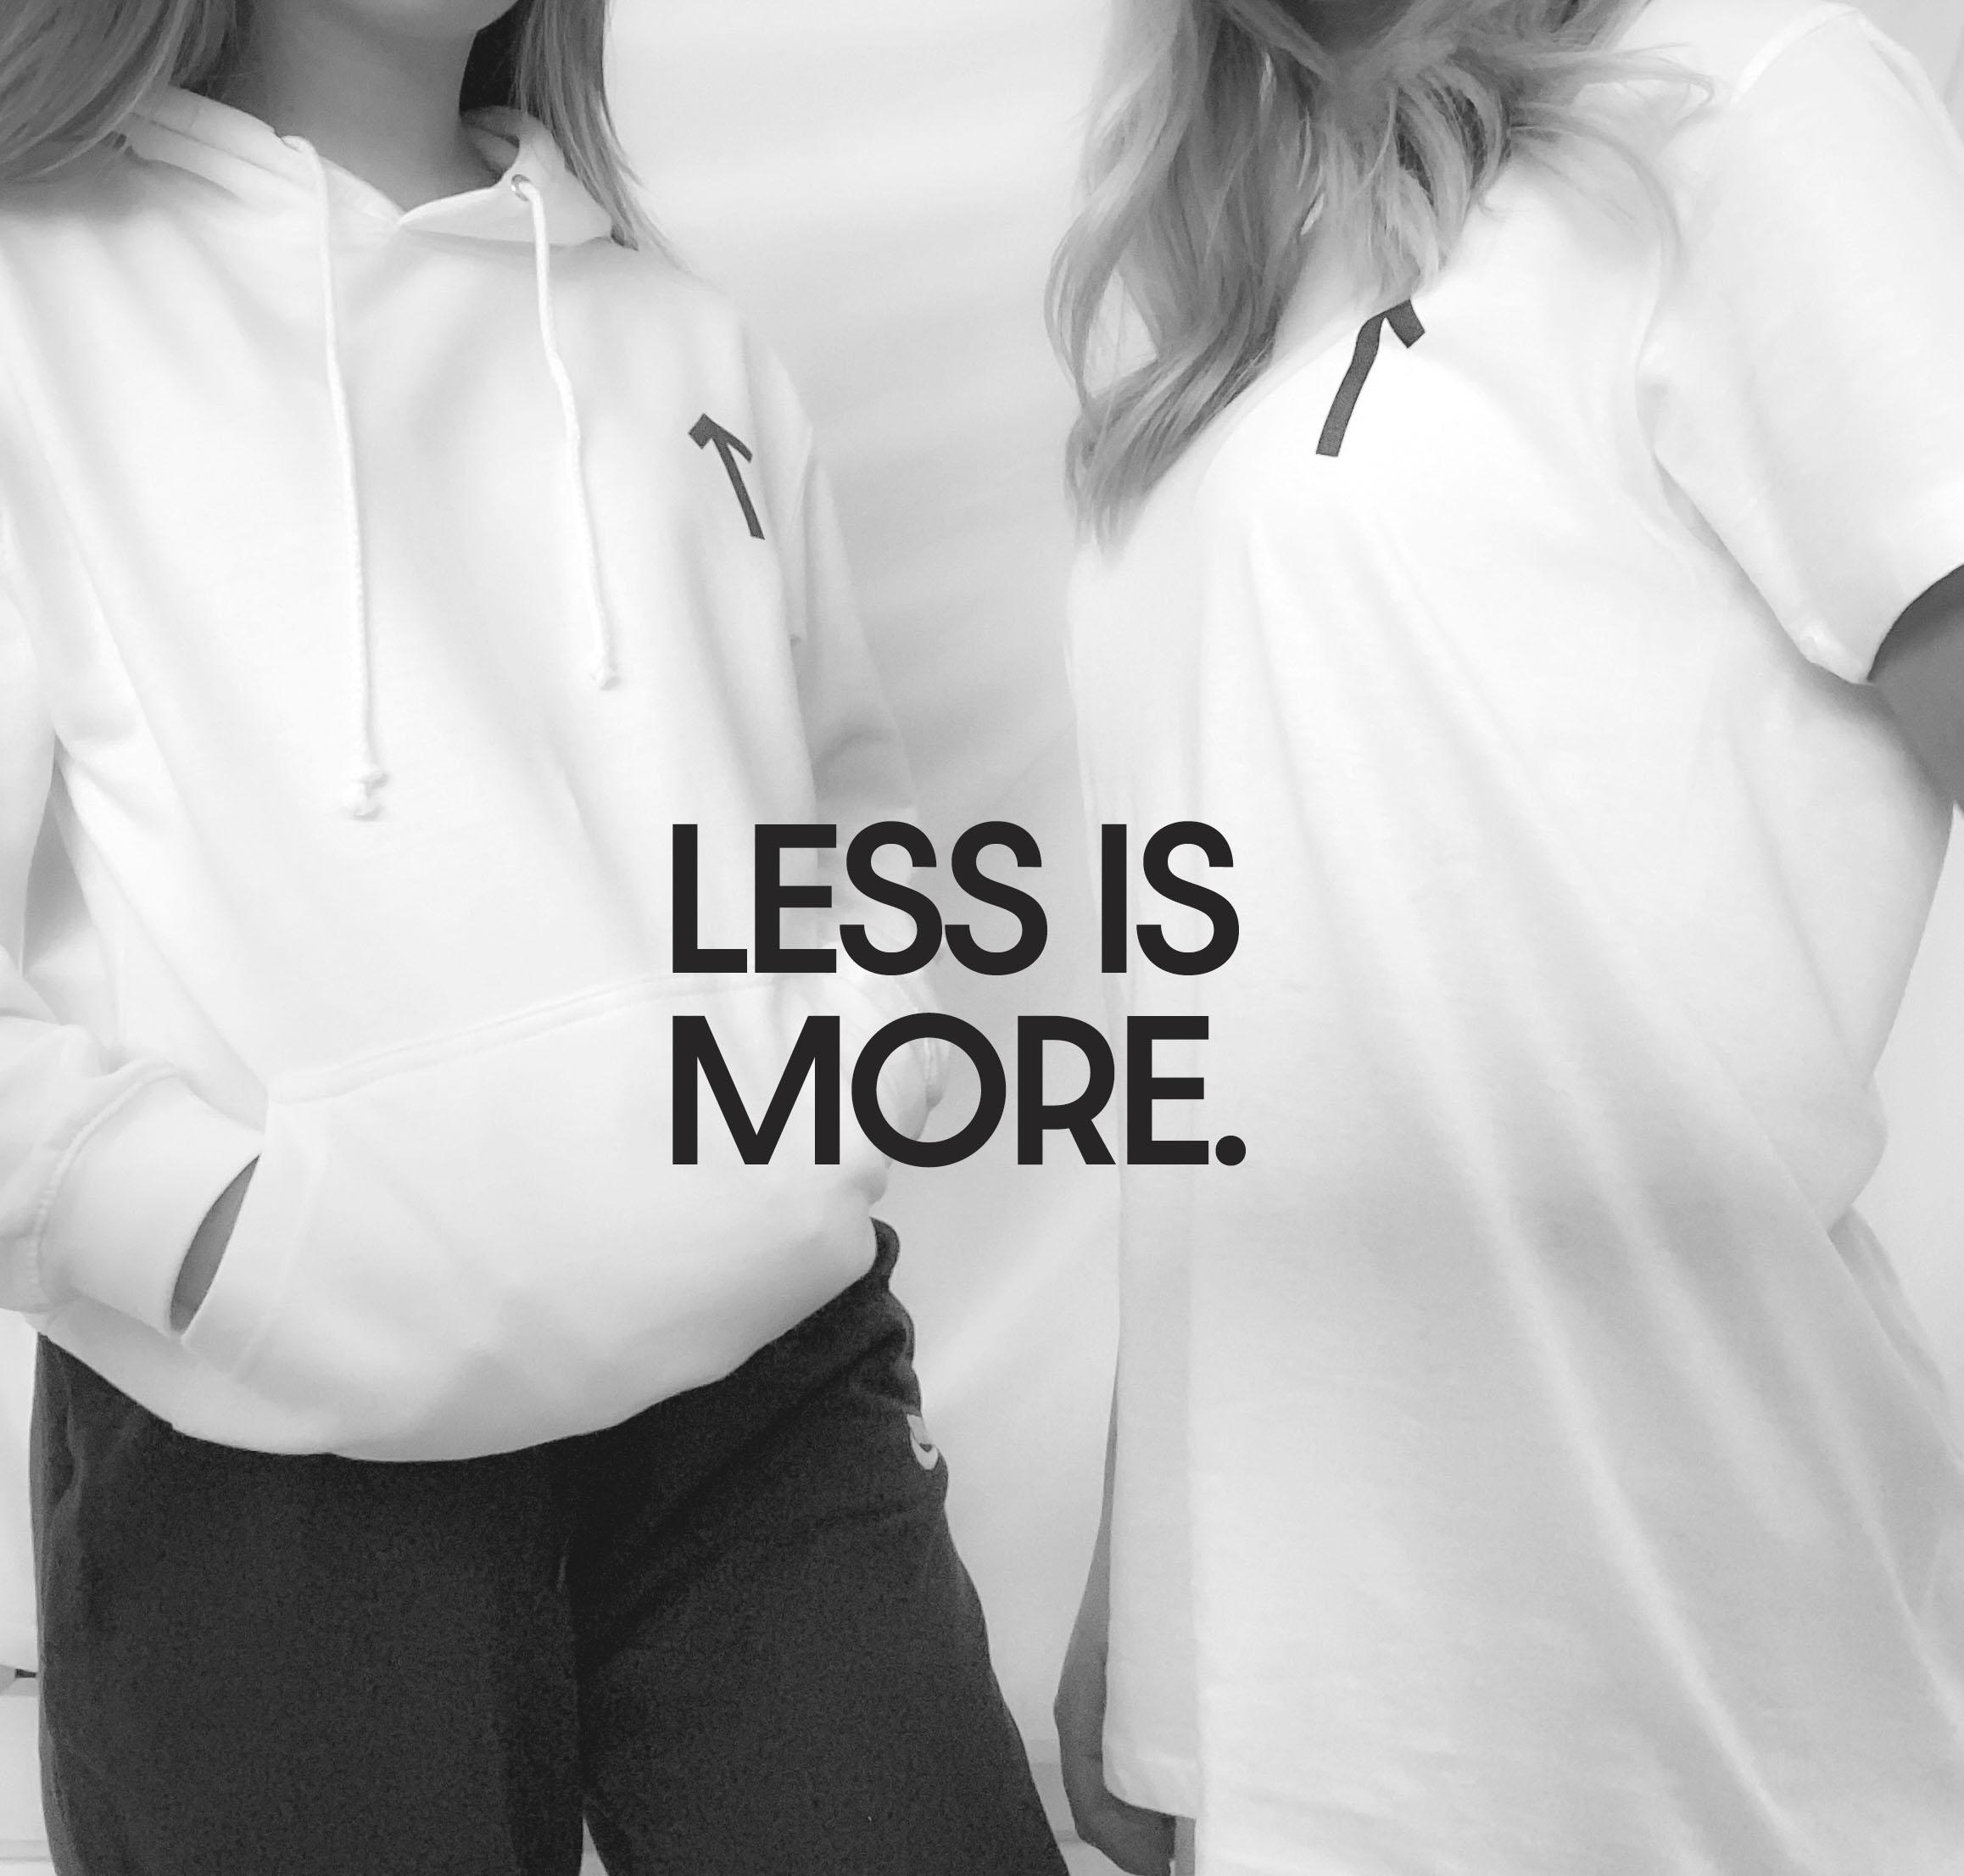 5 Less